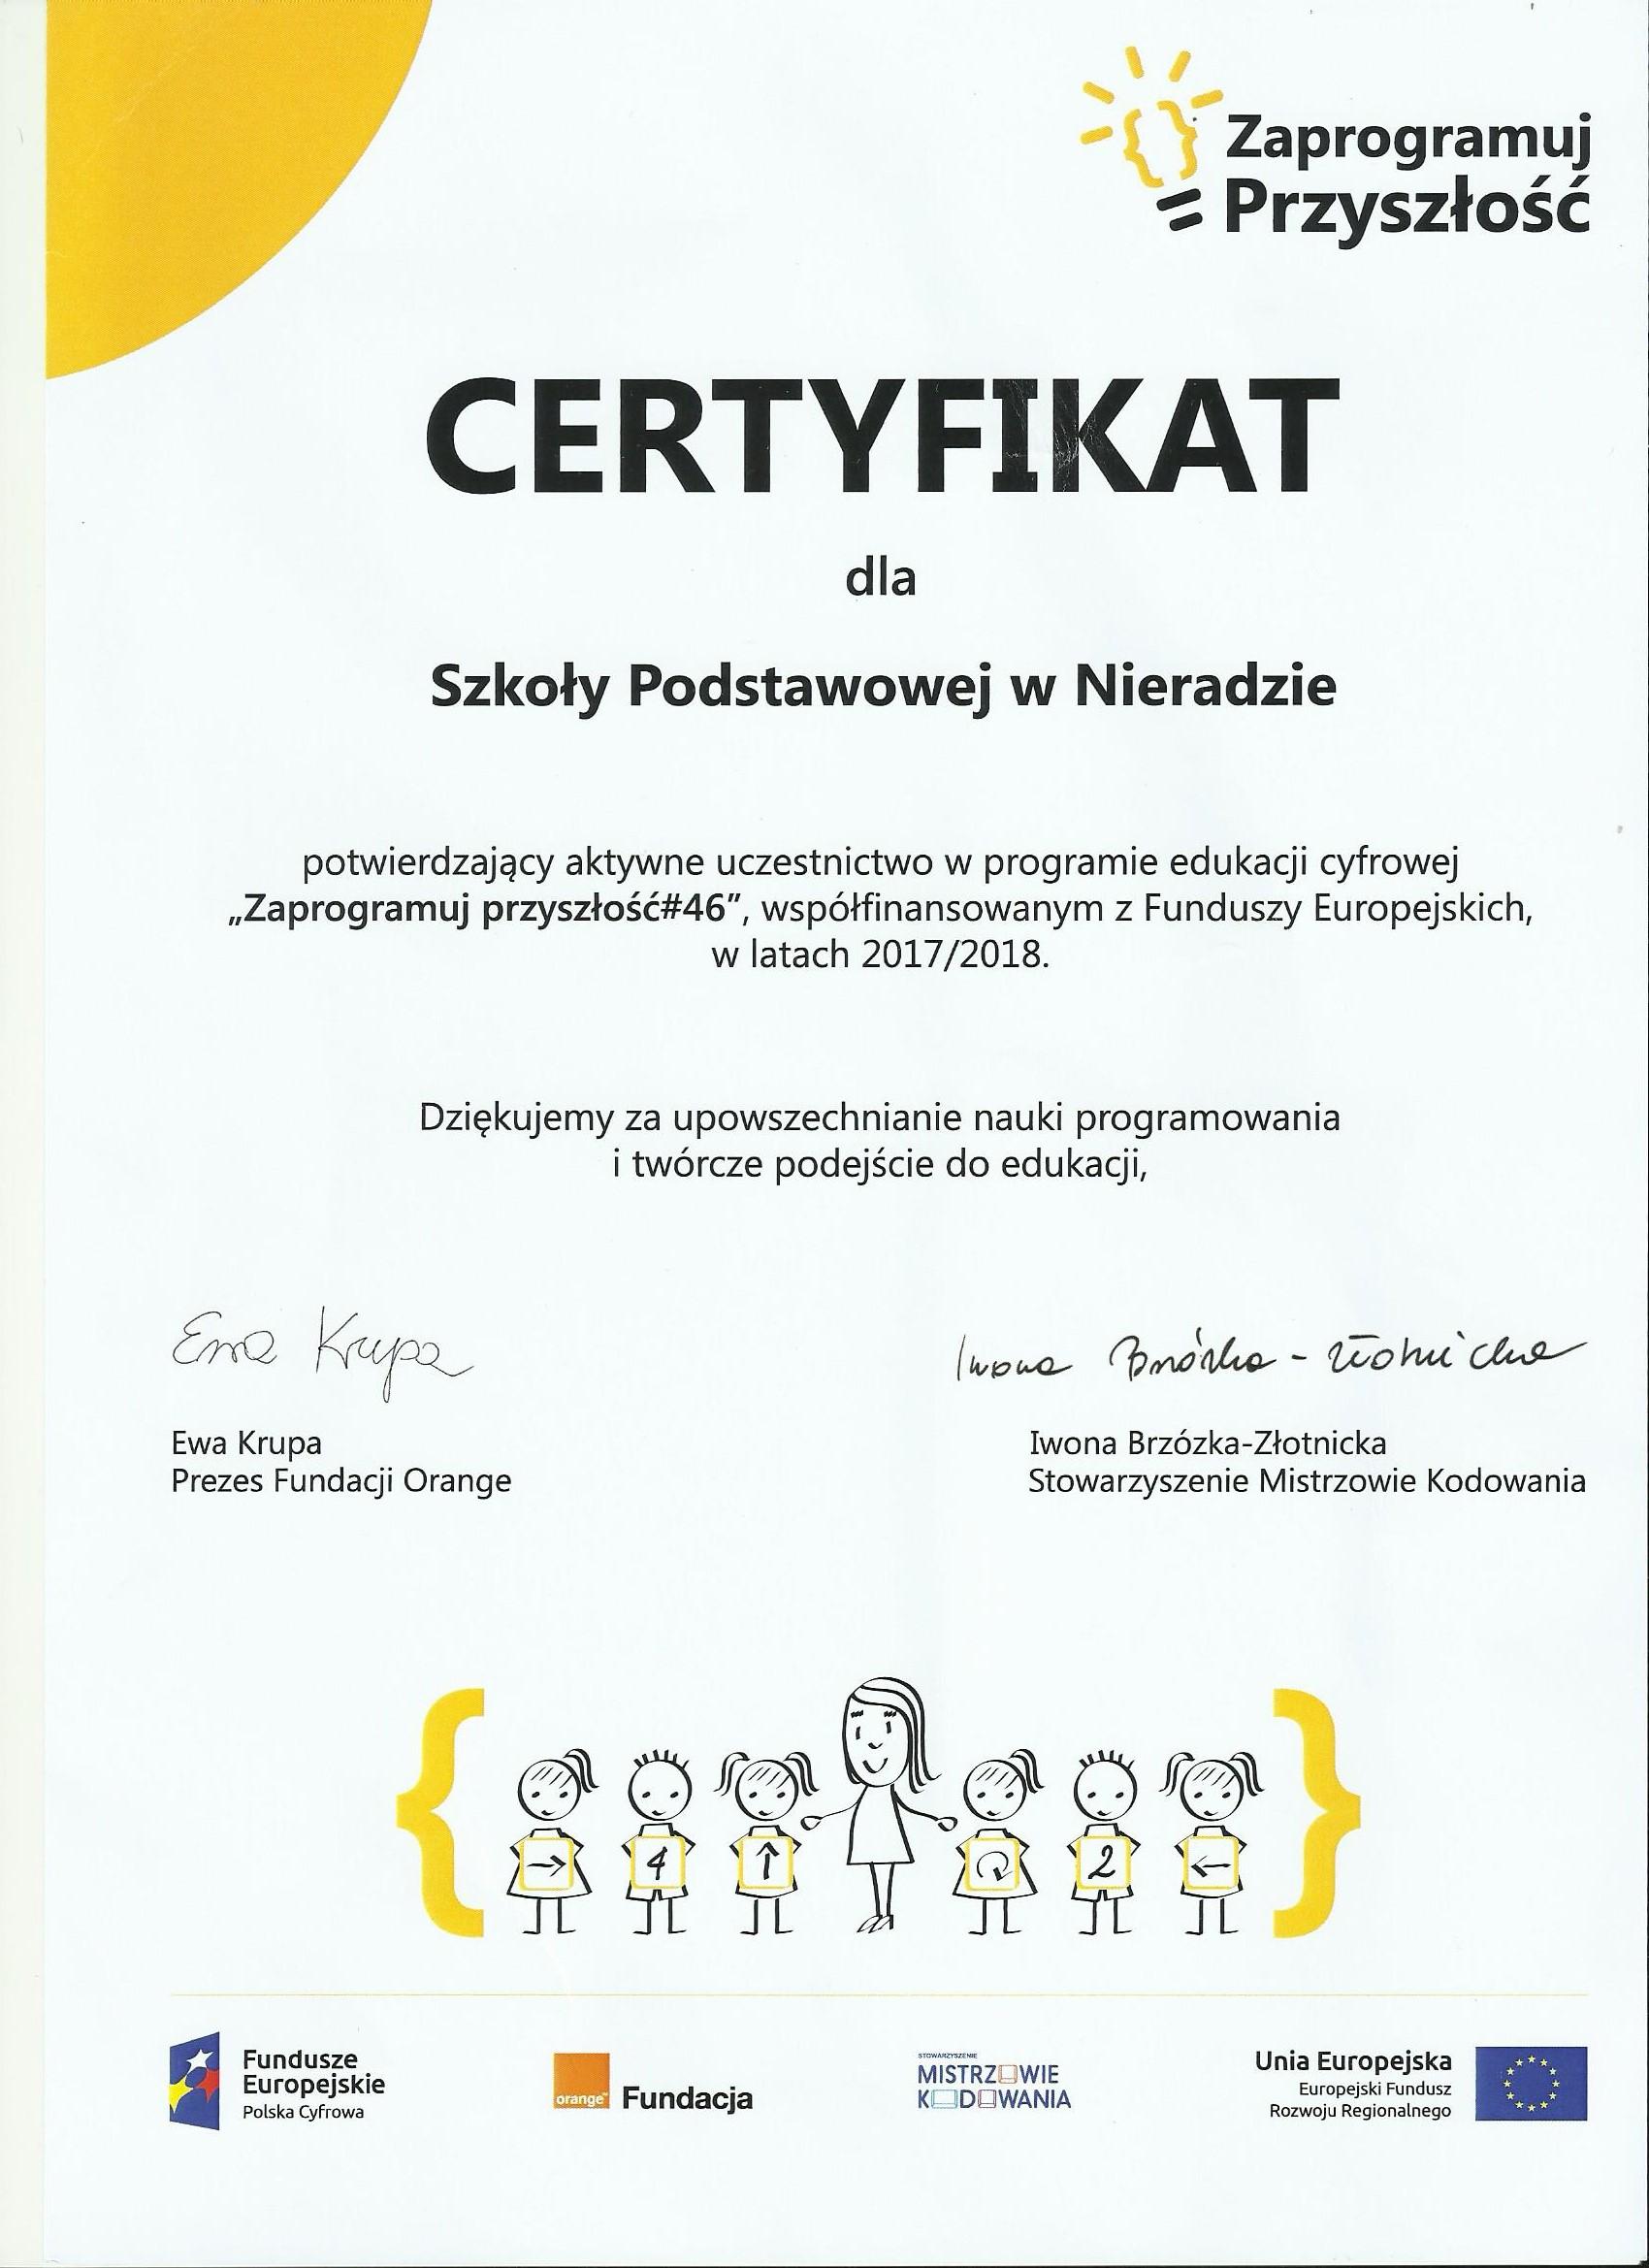 http://spnierada.szkolnastrona.pl/container/zaprogramuj.jpg